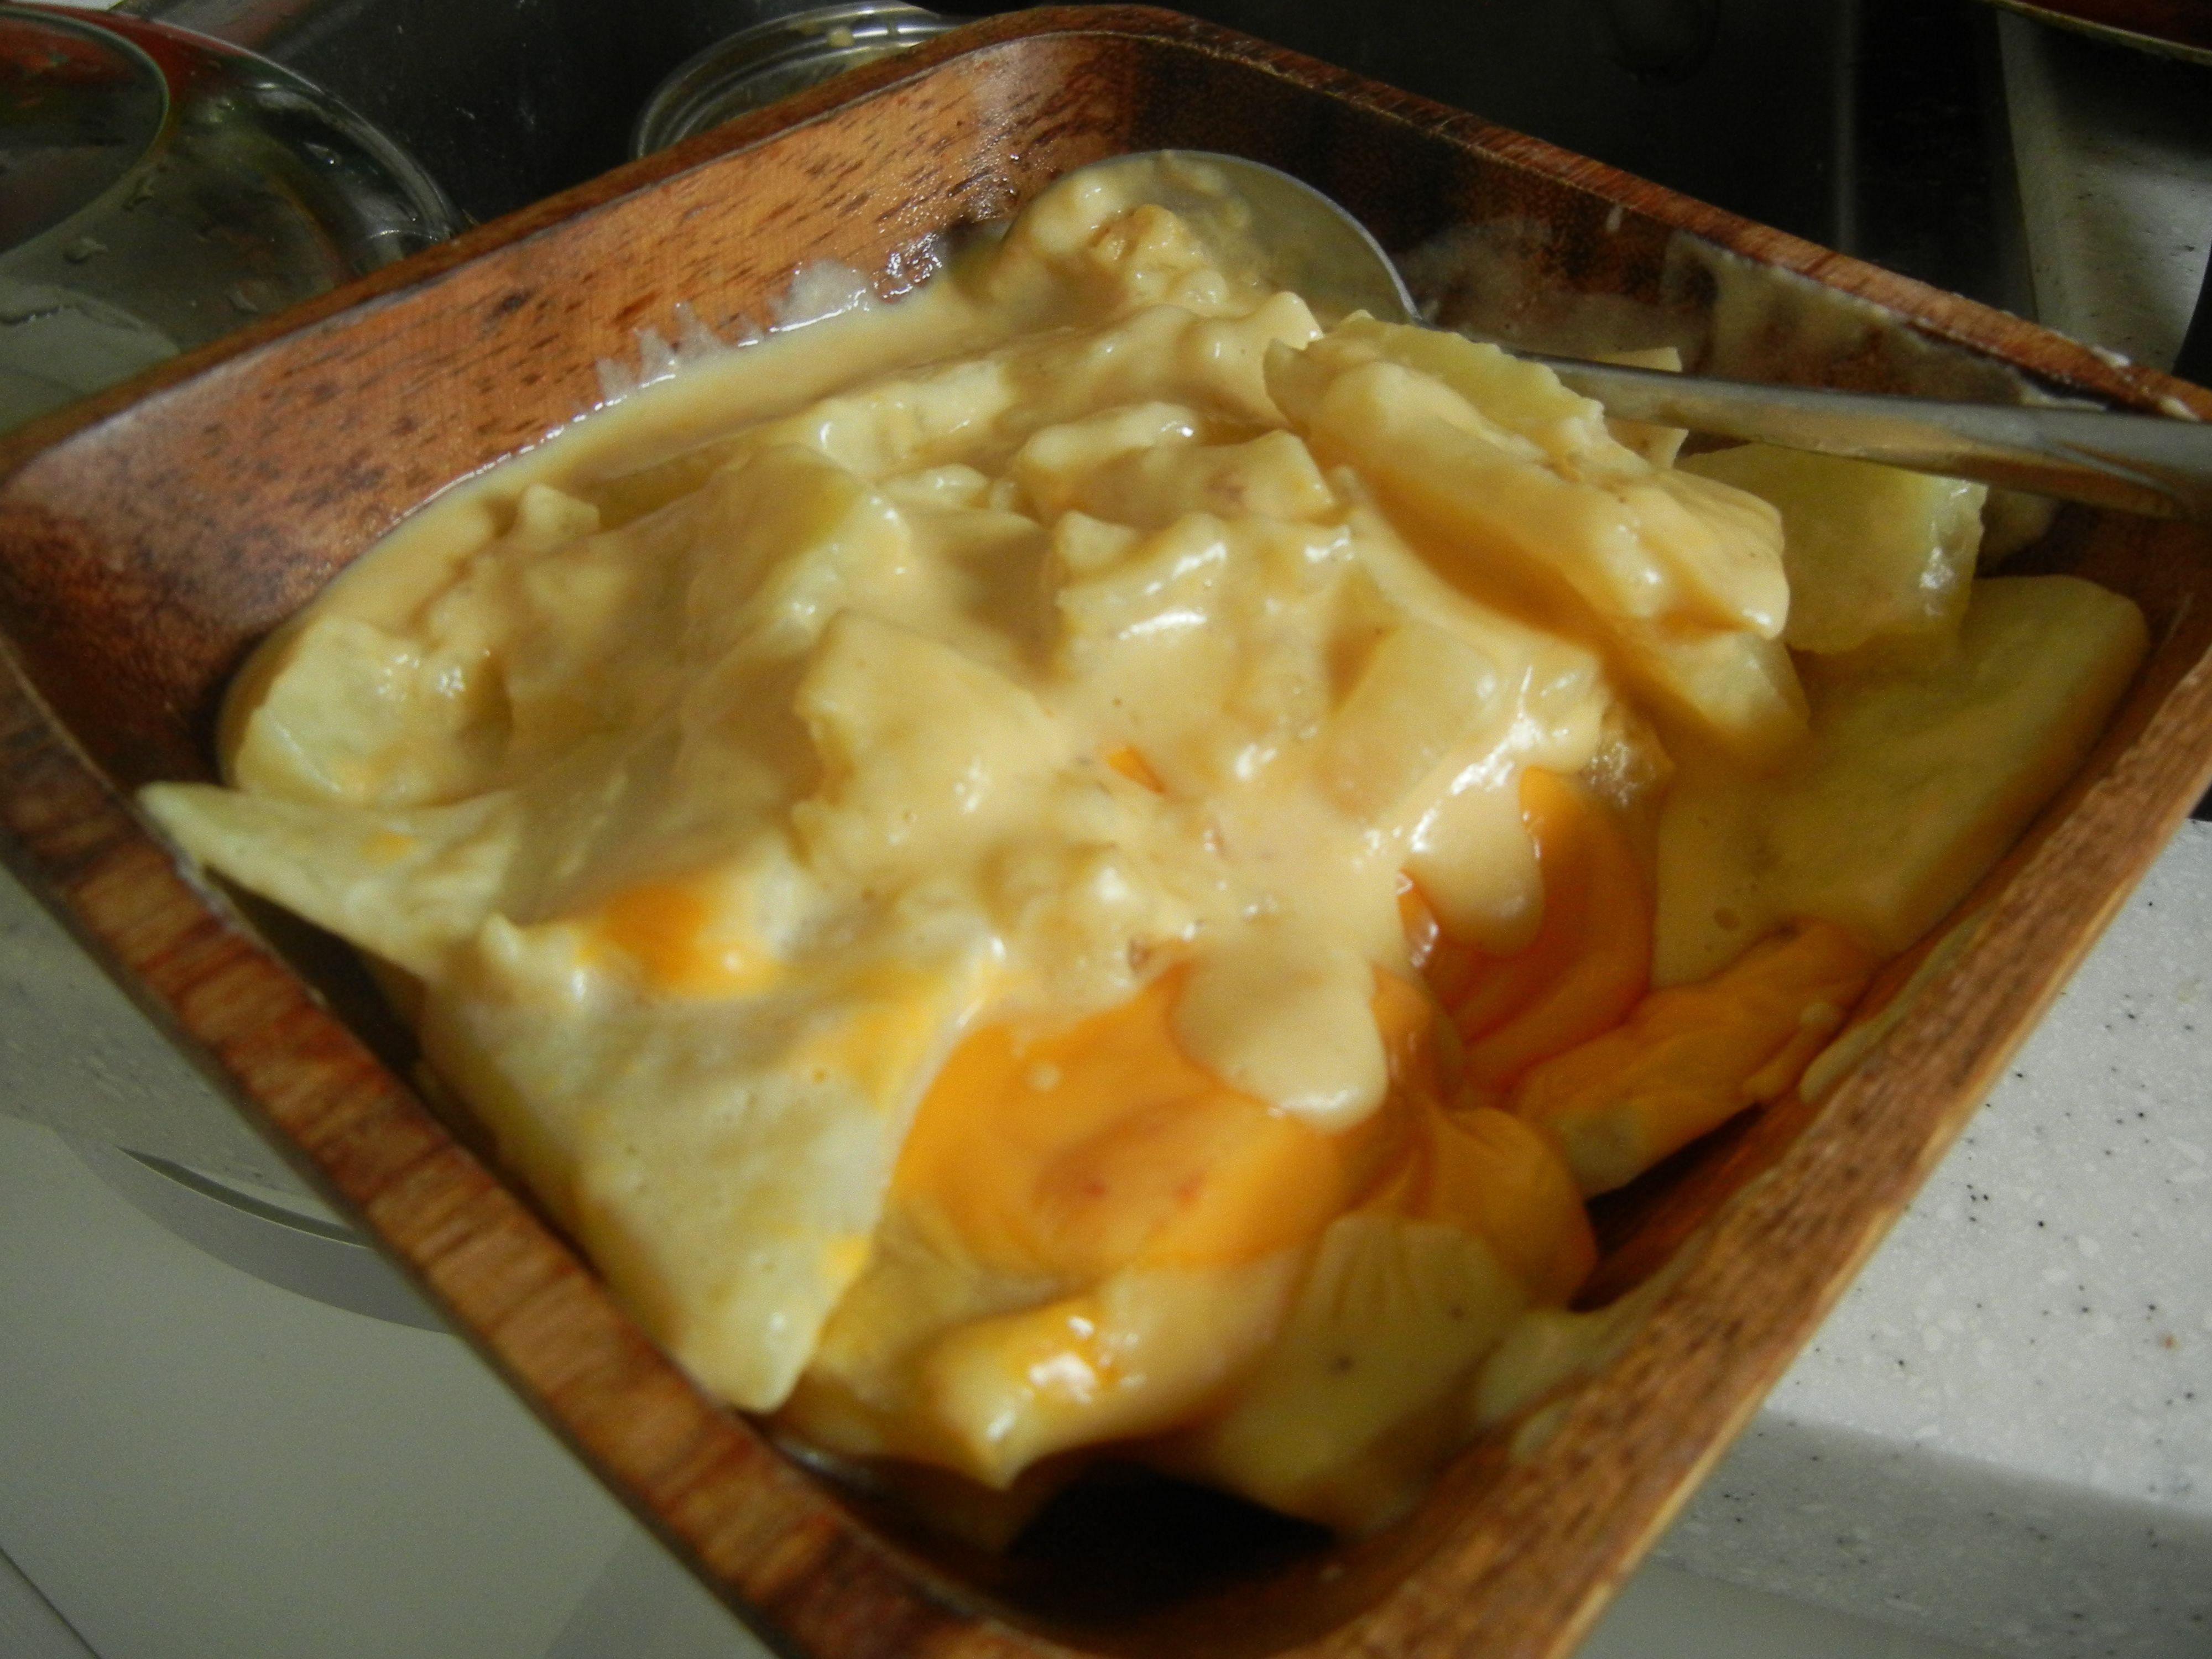 Extra Creamy Scalloped Potatoes